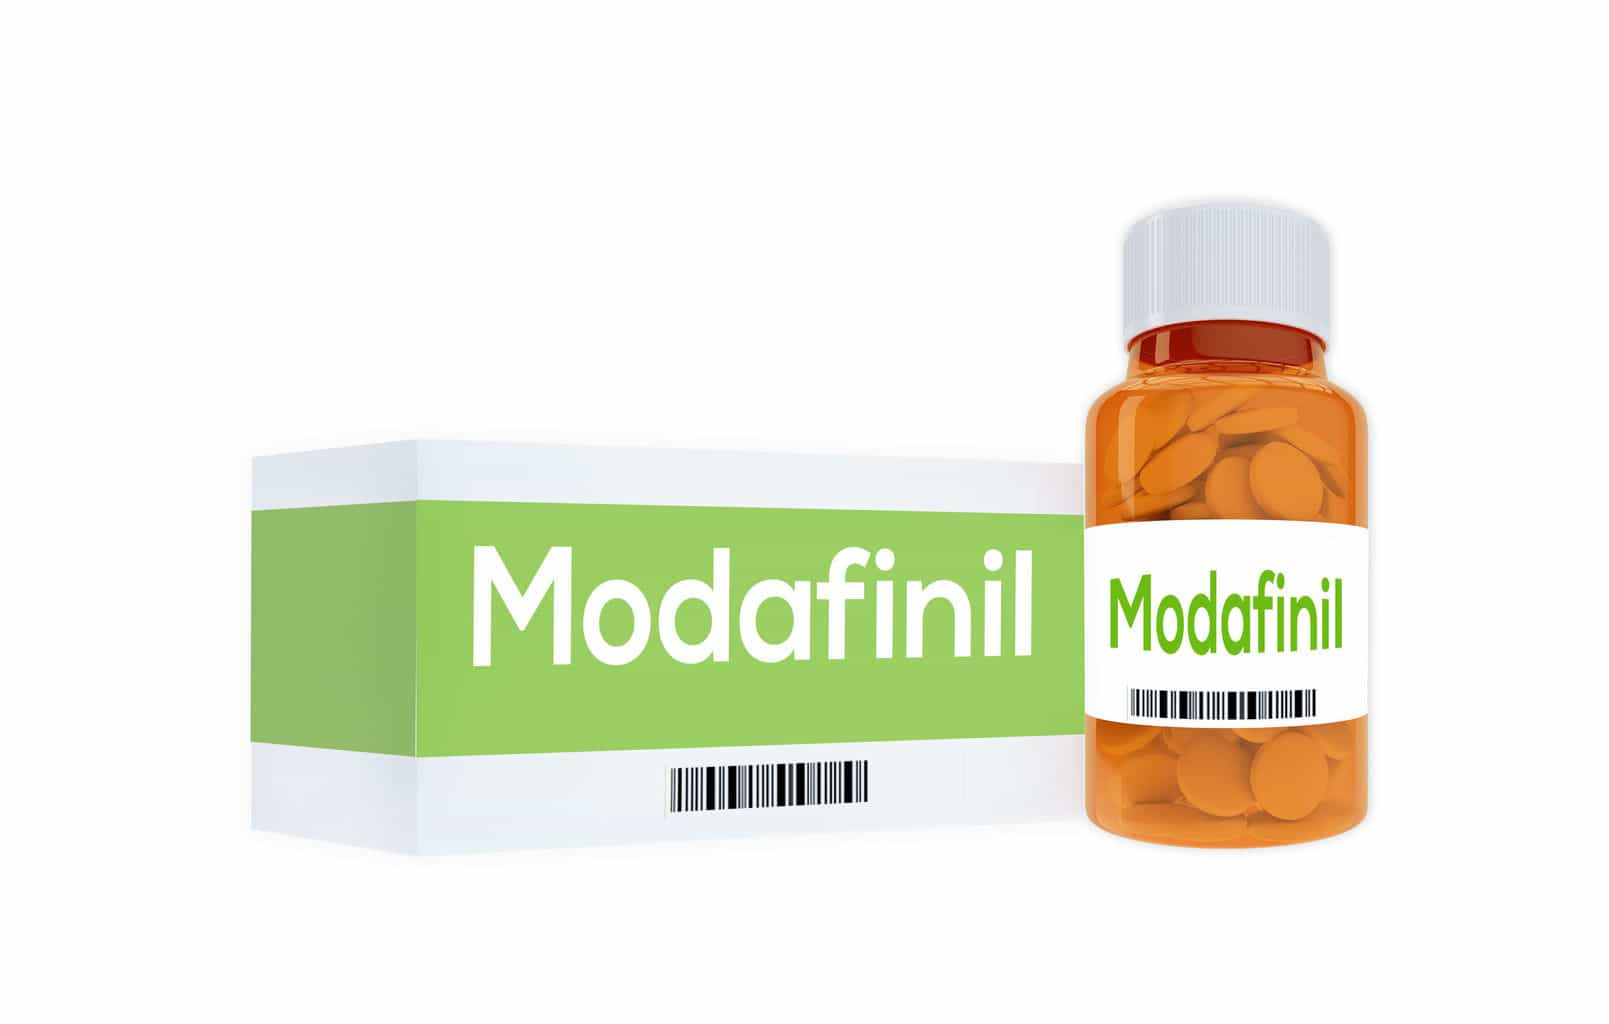 Is modafinil good?